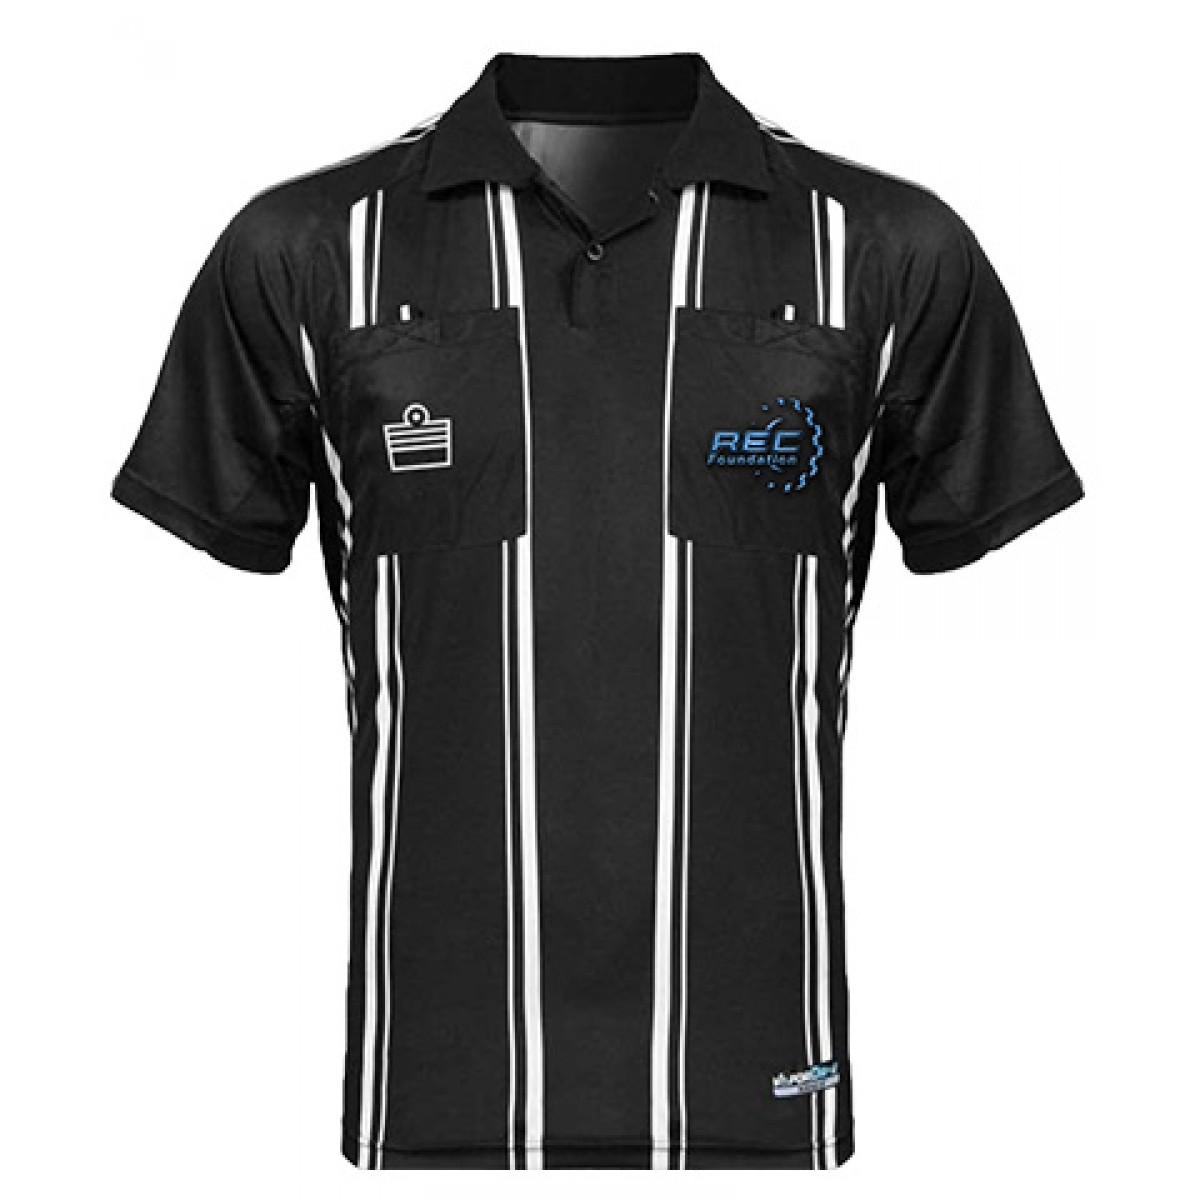 Admiral Pro Referee Jersey SS-Black-S